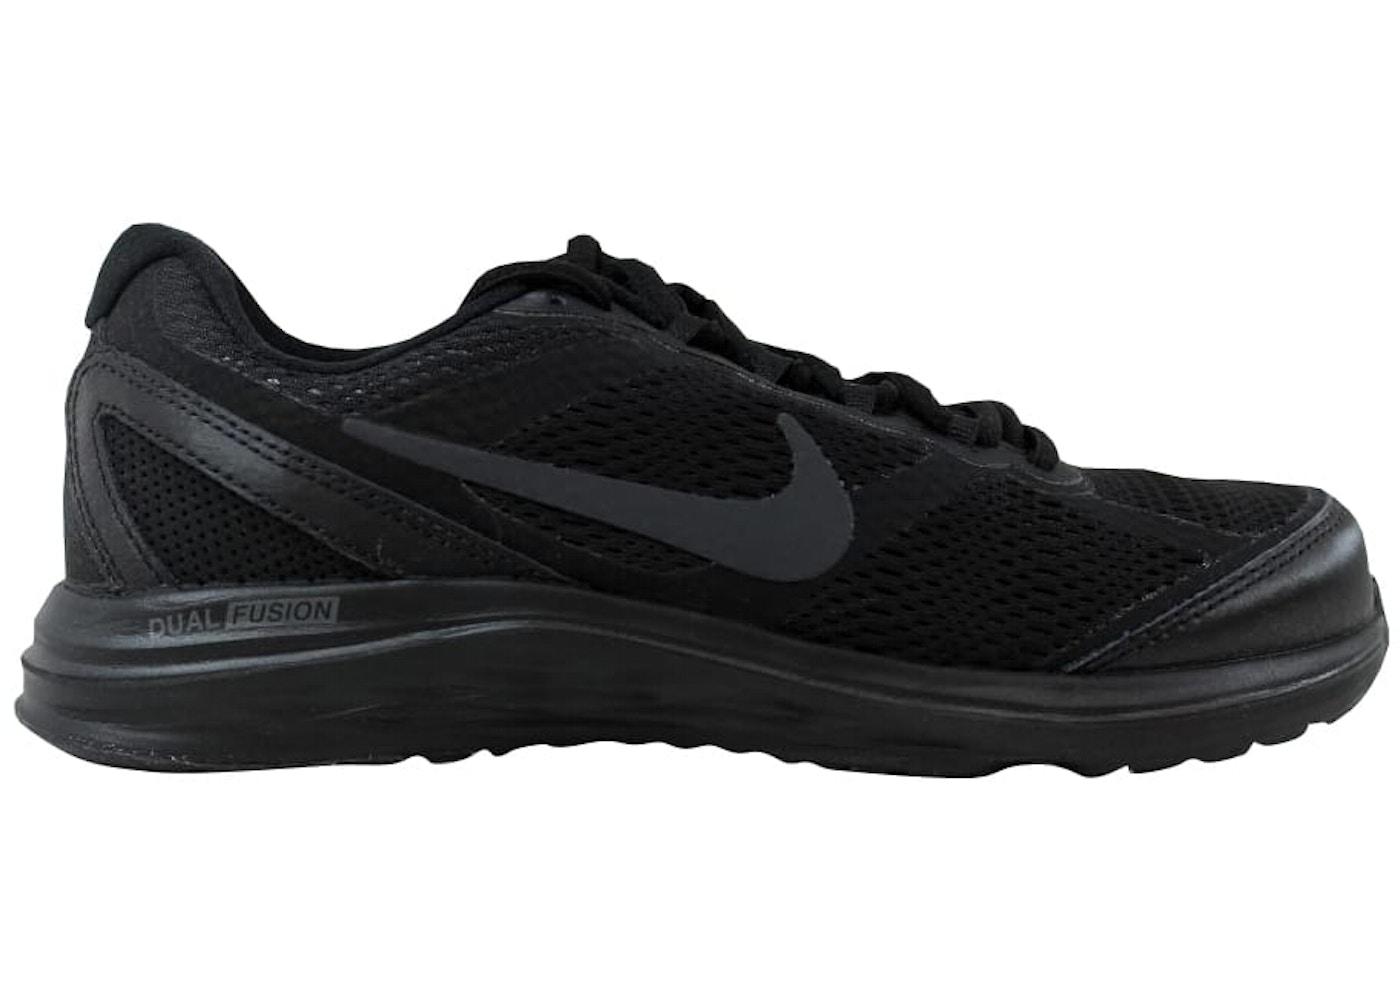 acheter en ligne 2447b 0eb32 Nike Dual Fusion Run 3 Black/Black-Anthracite (W)